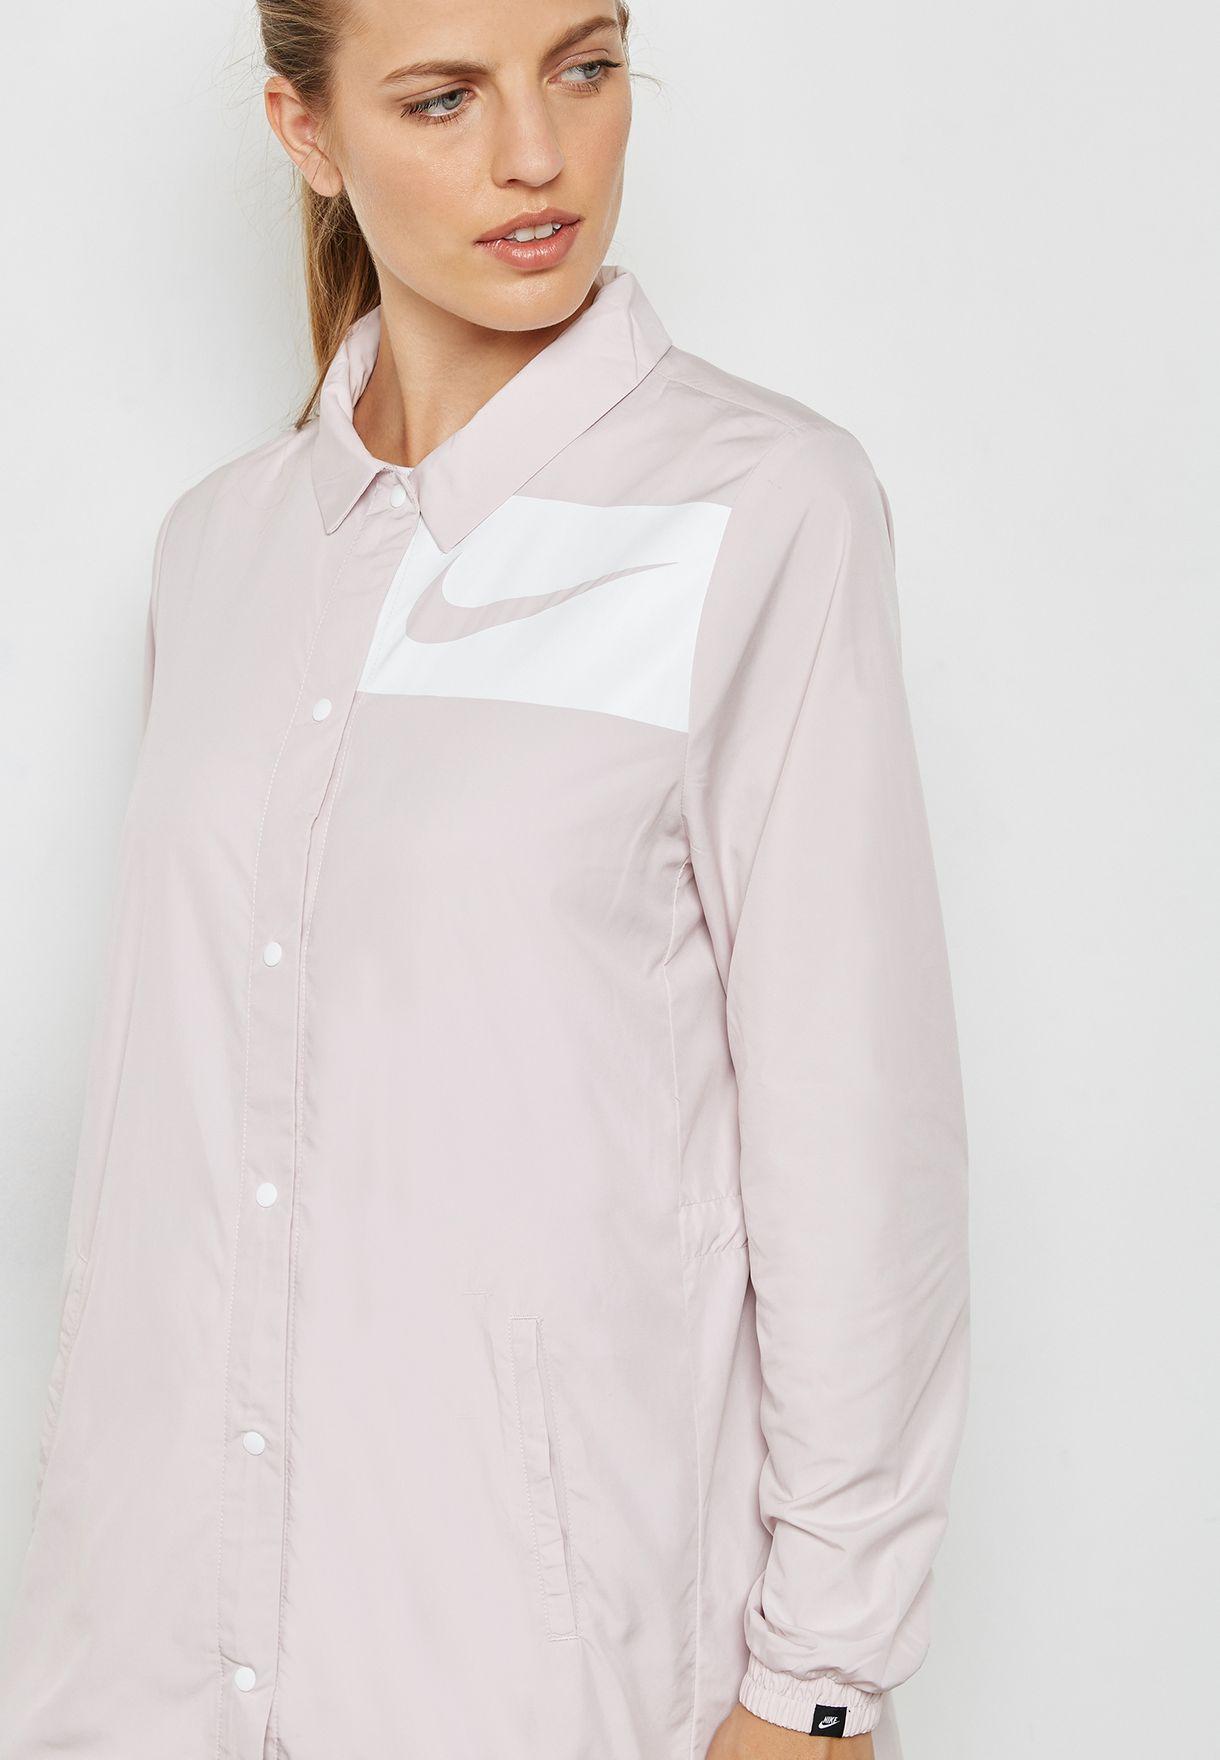 3636700eef Shop Nike pink Swoosh Jacket 893029-699 for Women in Saudi ...